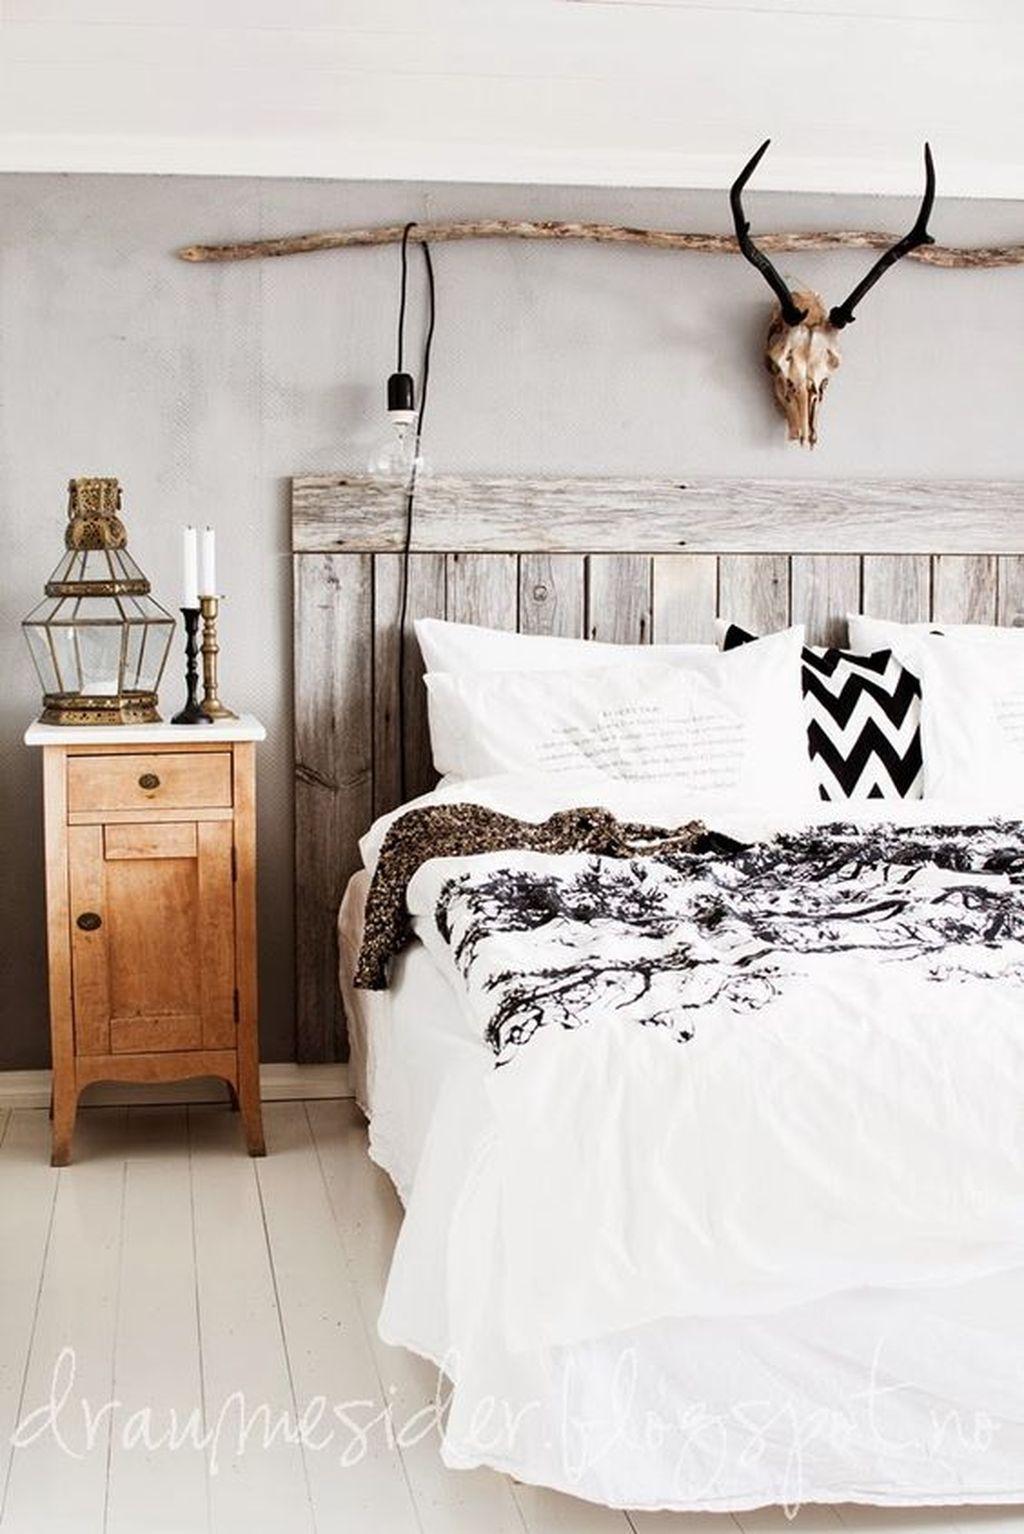 Diy bedroom headboard ideas  best creative diy headboard ideas with lights for your bedroom